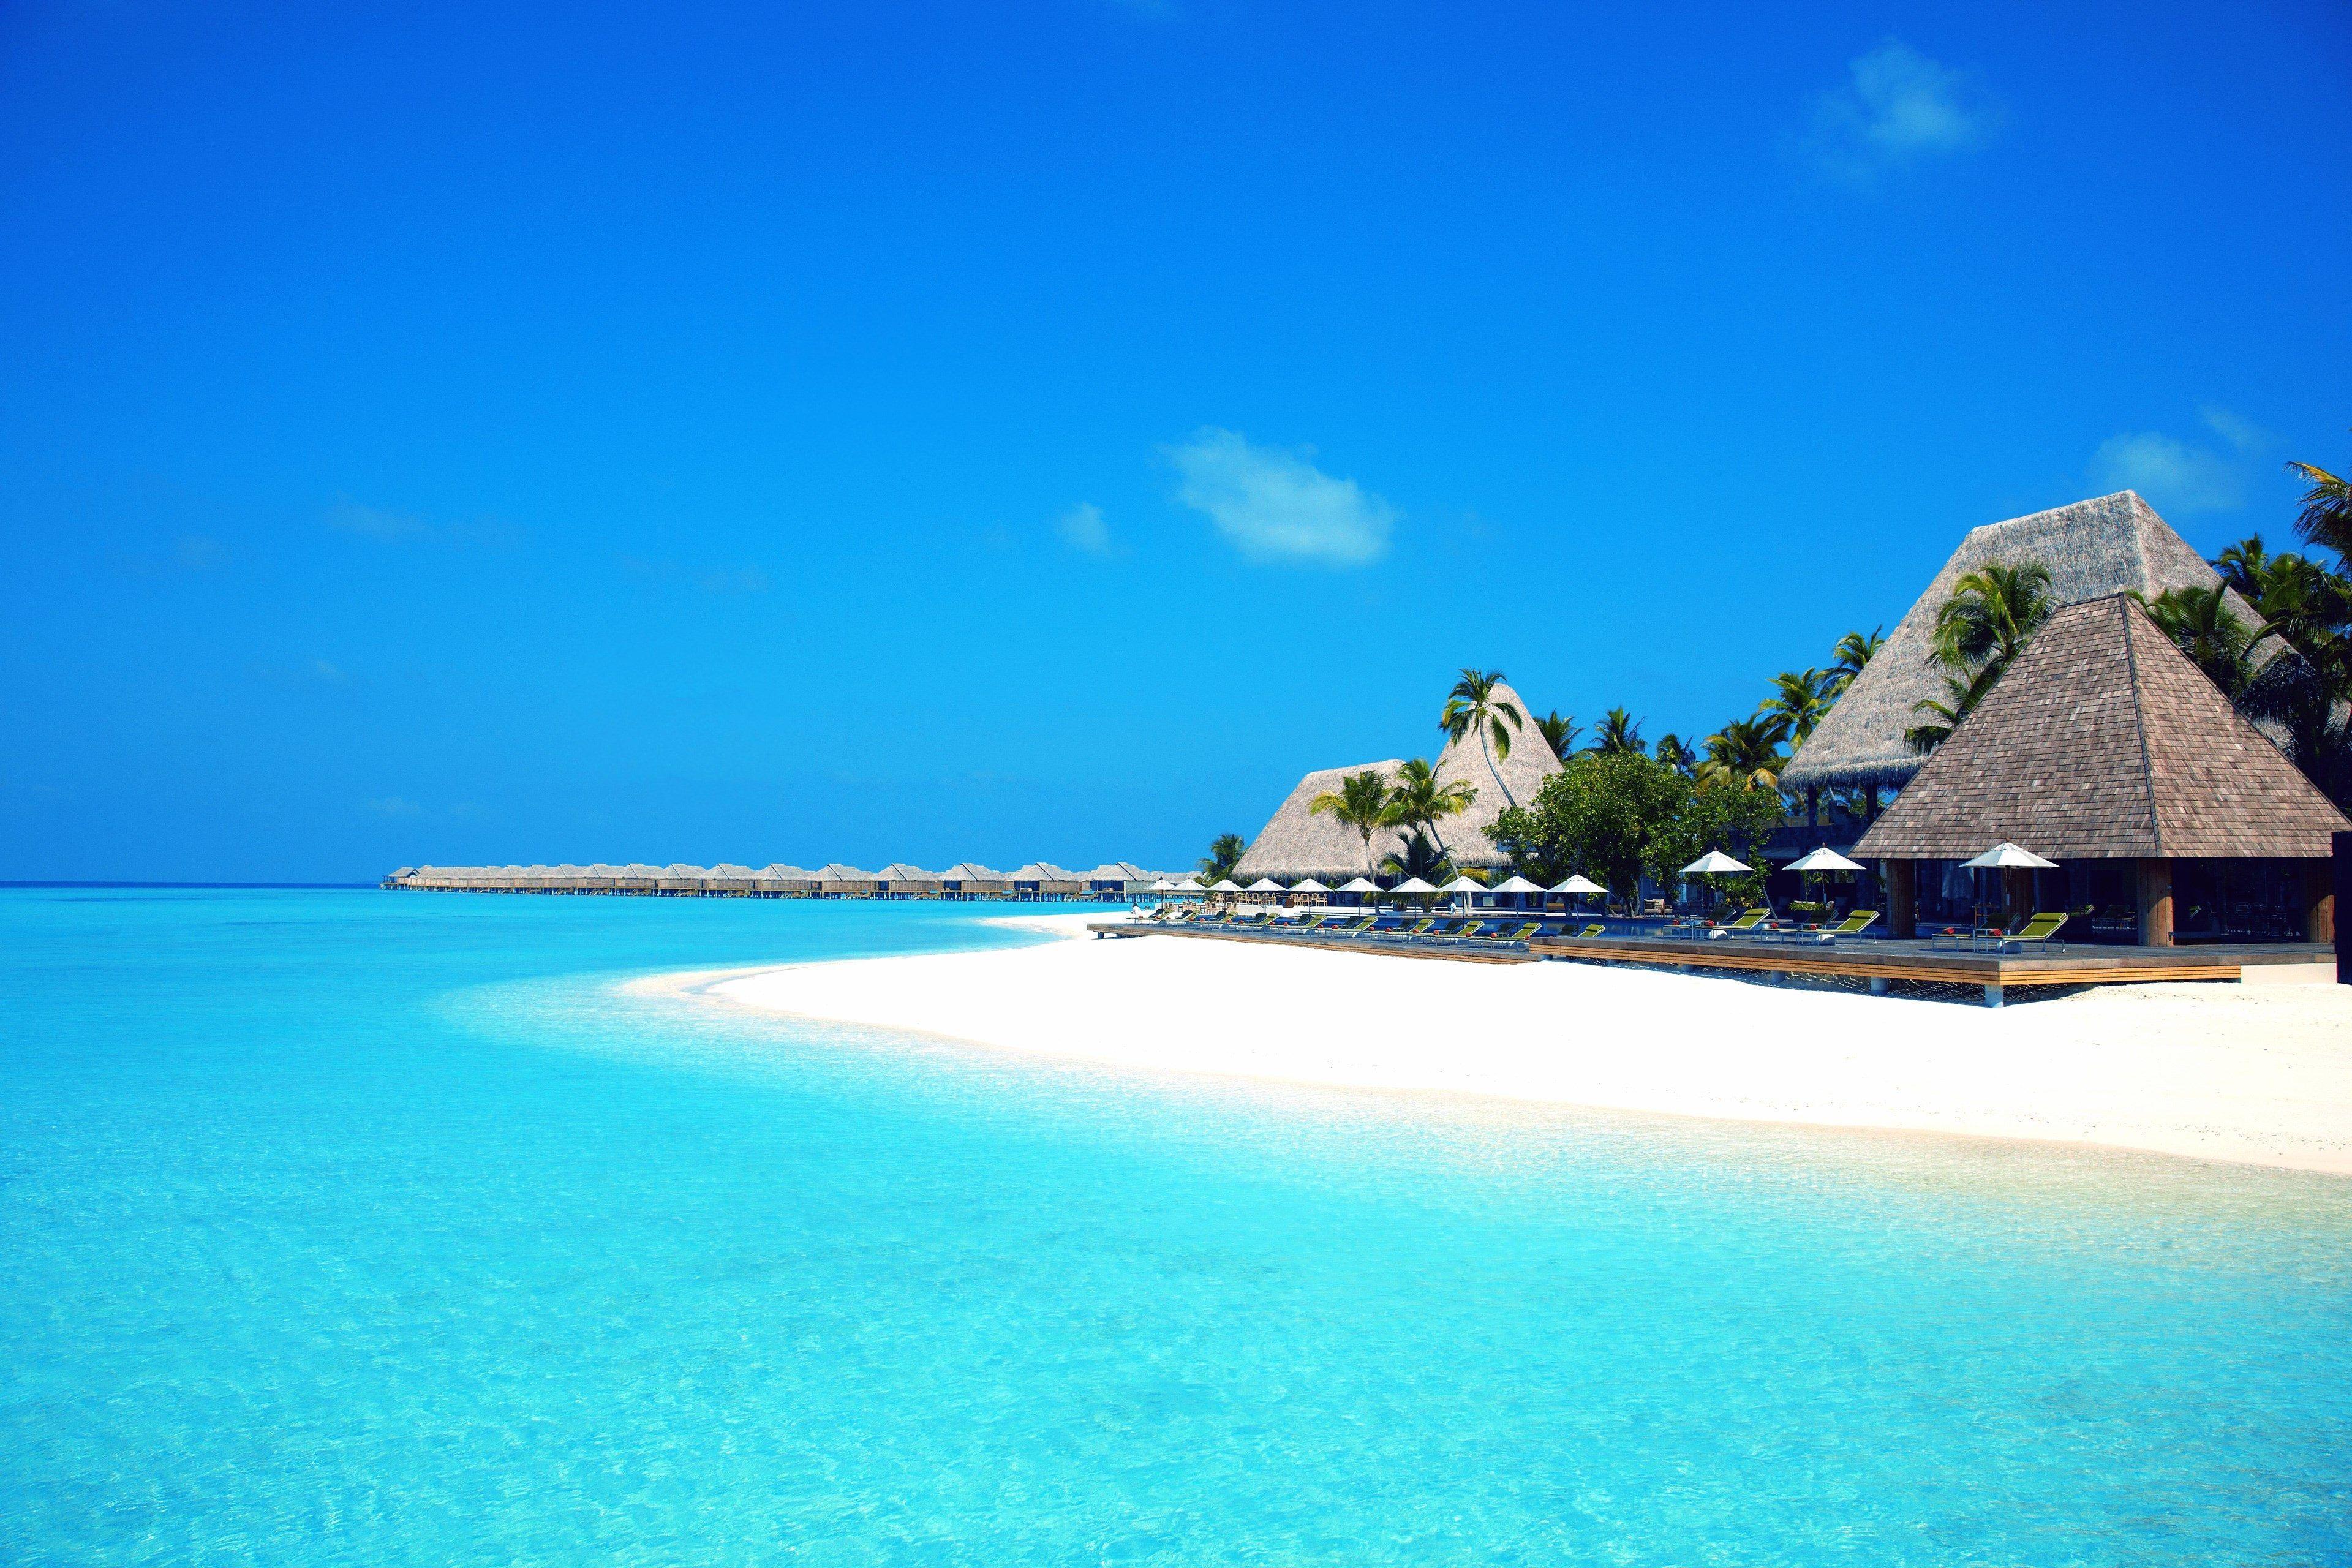 4K Maldives Wallpapers - Top Free 4K Maldives Backgrounds ...